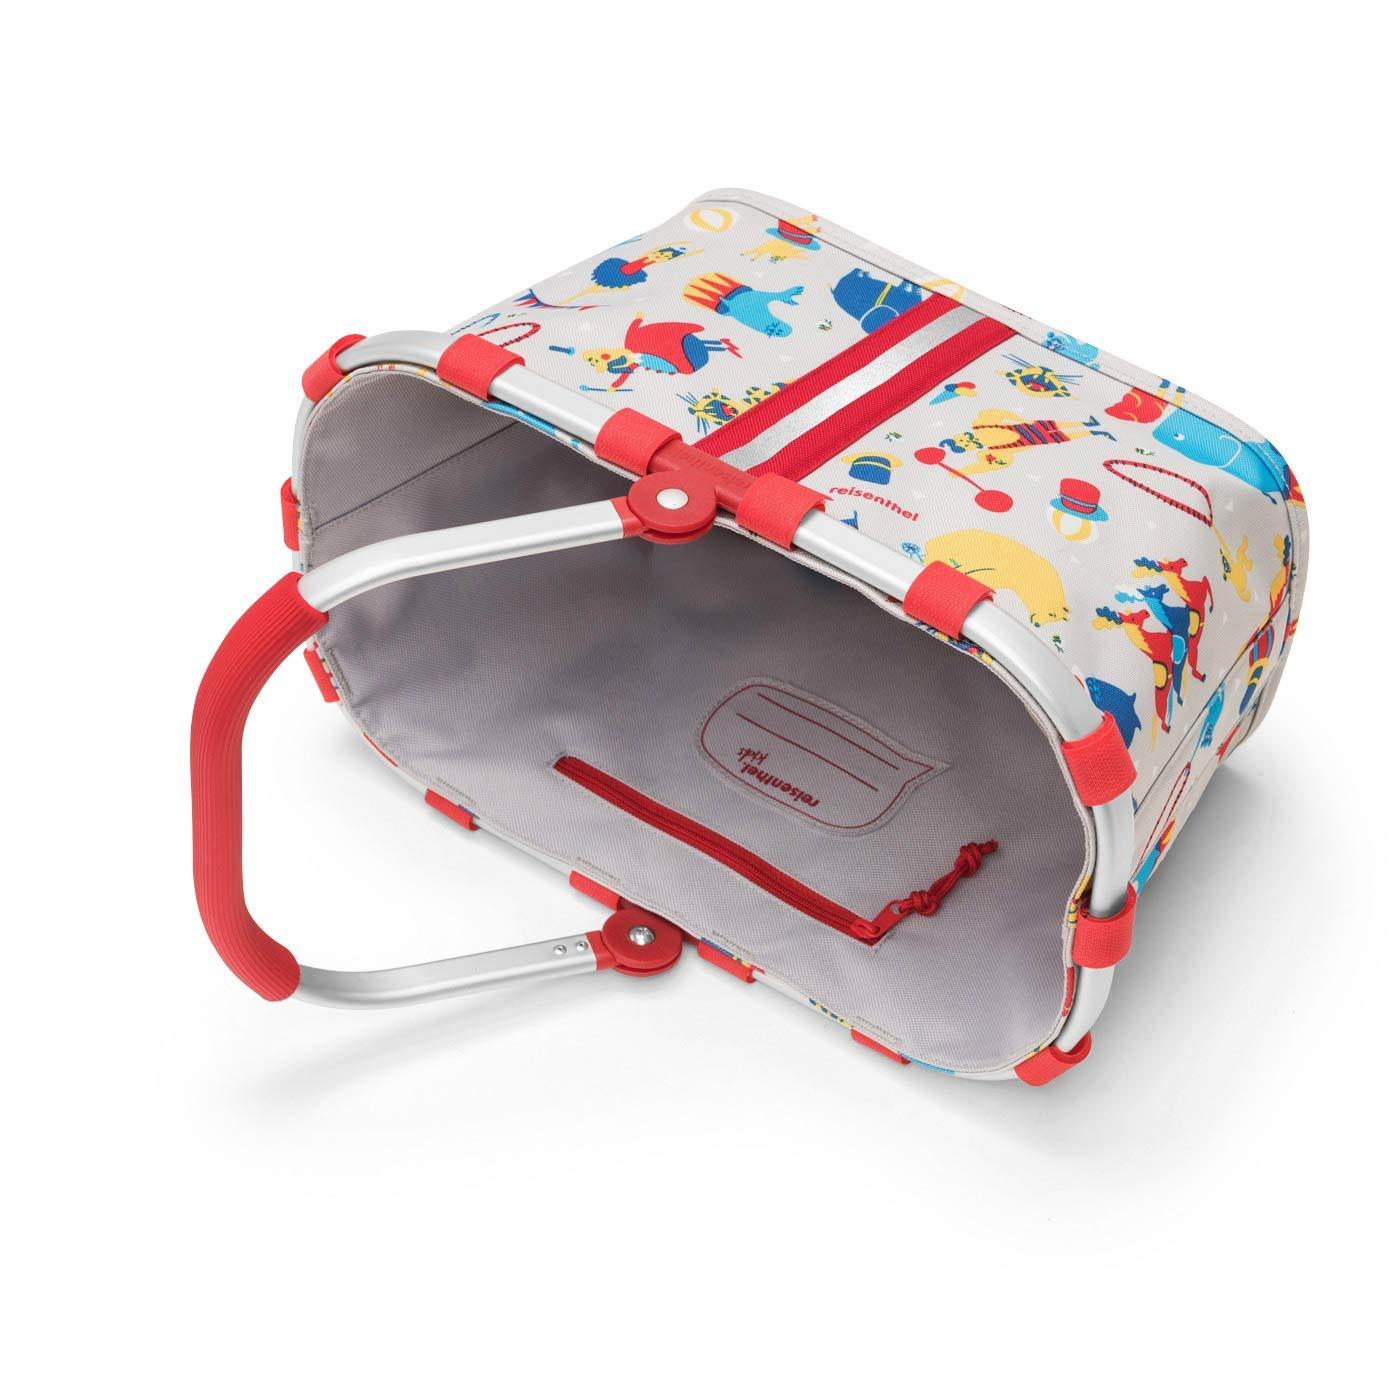 Reisenthel Carrybag XS Kids Shopping Basket Childrens Shopping Bag